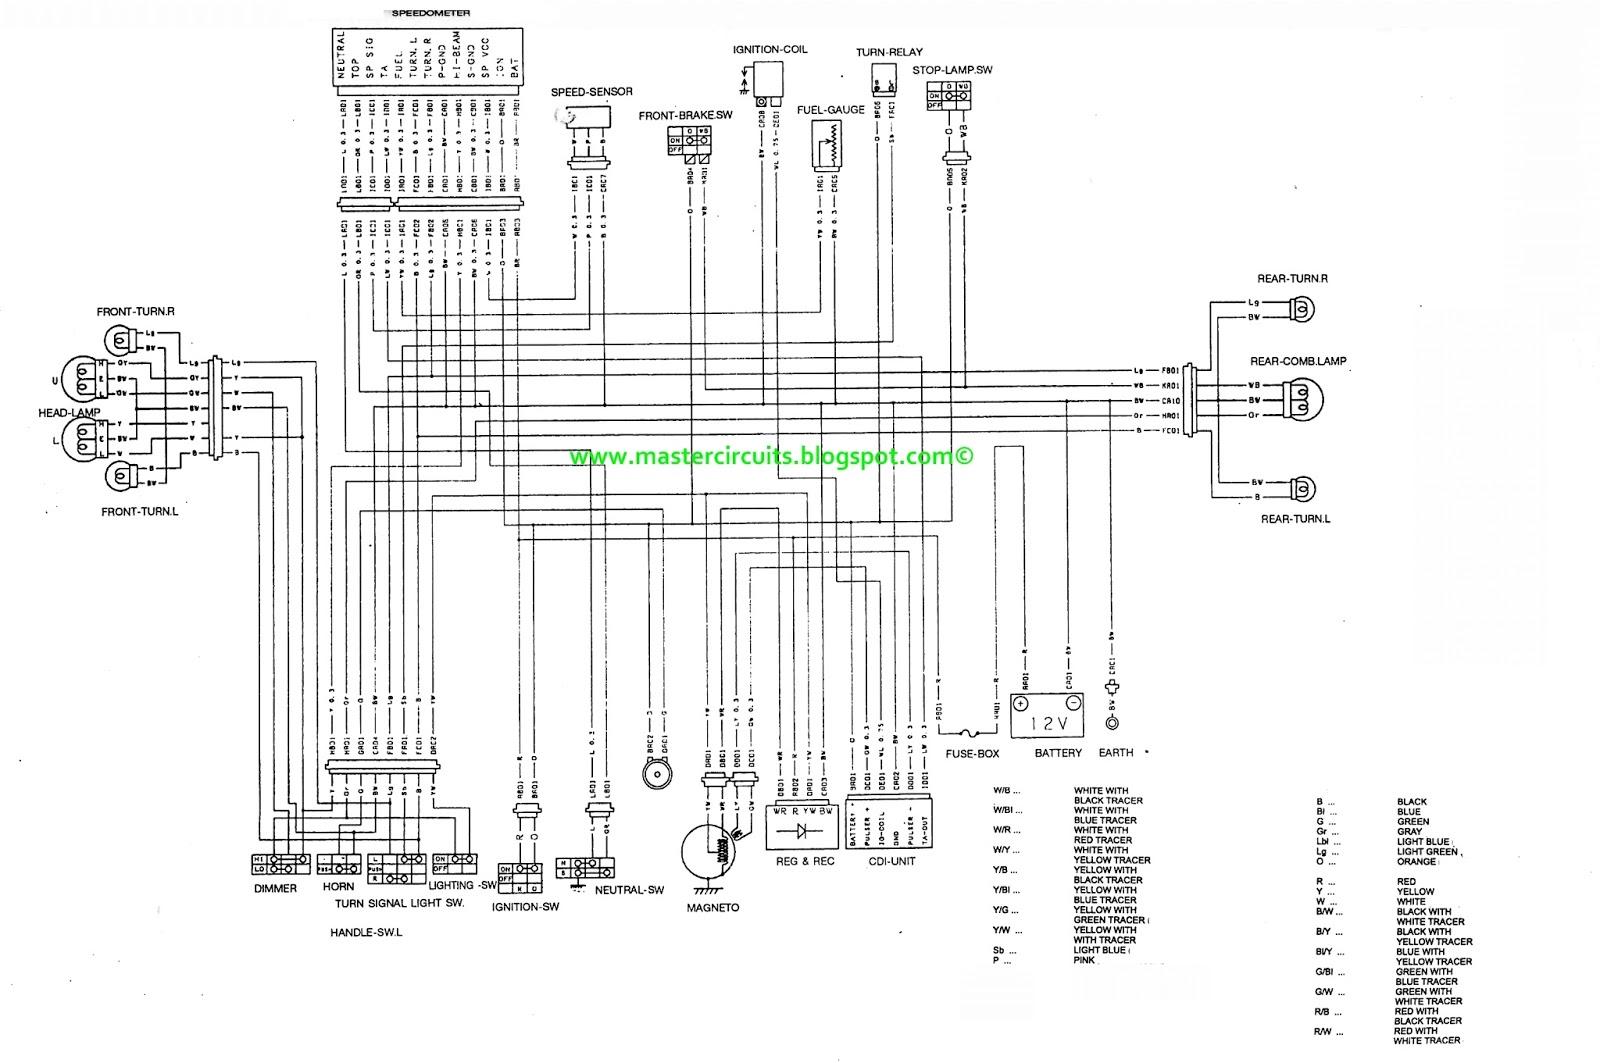 Suzuki Sx4 Wiring Diagram Headlight Wire 2009 Engine Luxury Composition Best Images For Enchanting